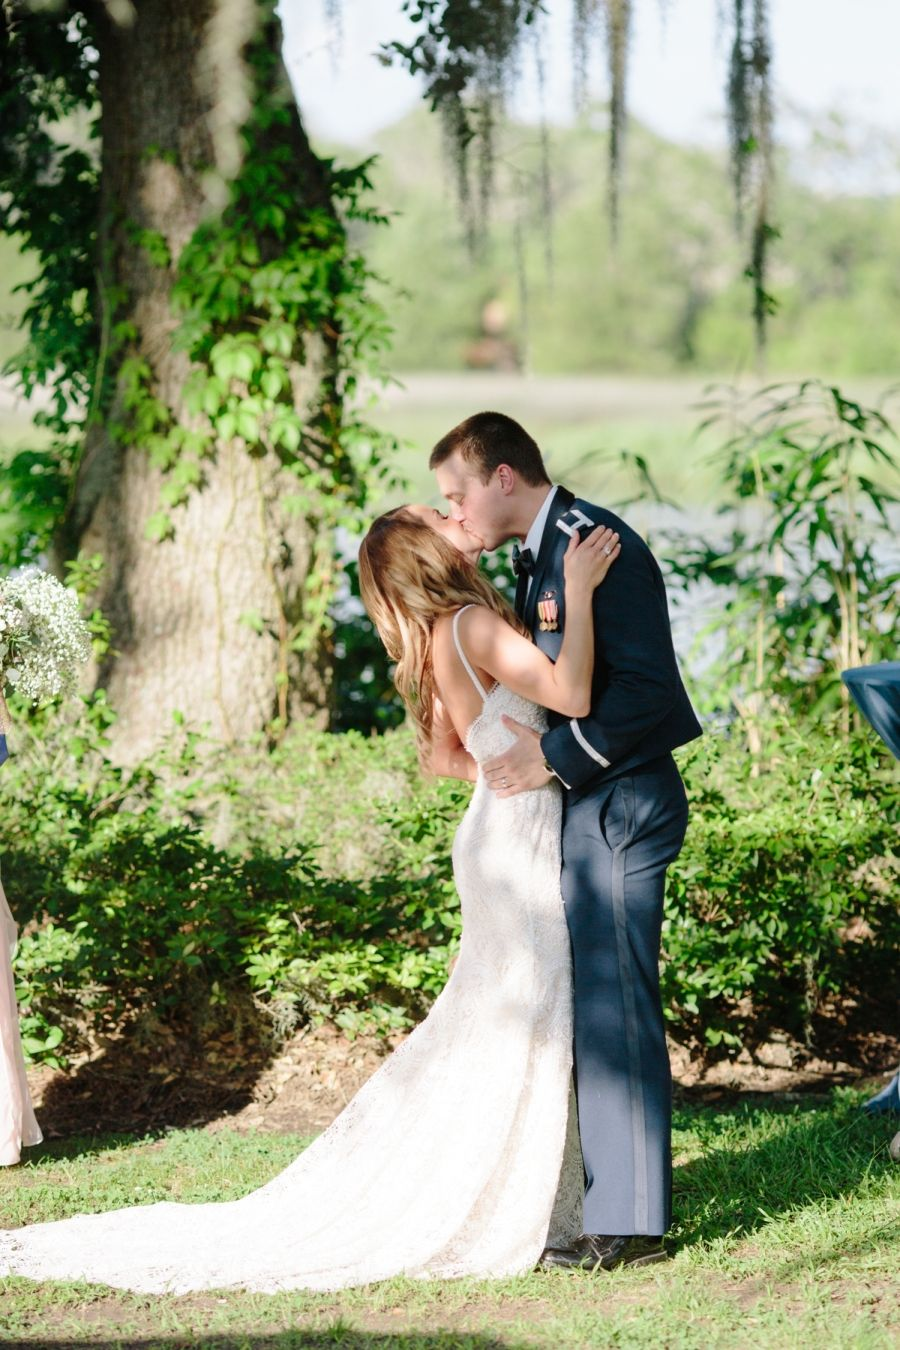 Pin on Magnolia Plantation & Gardens Weddings